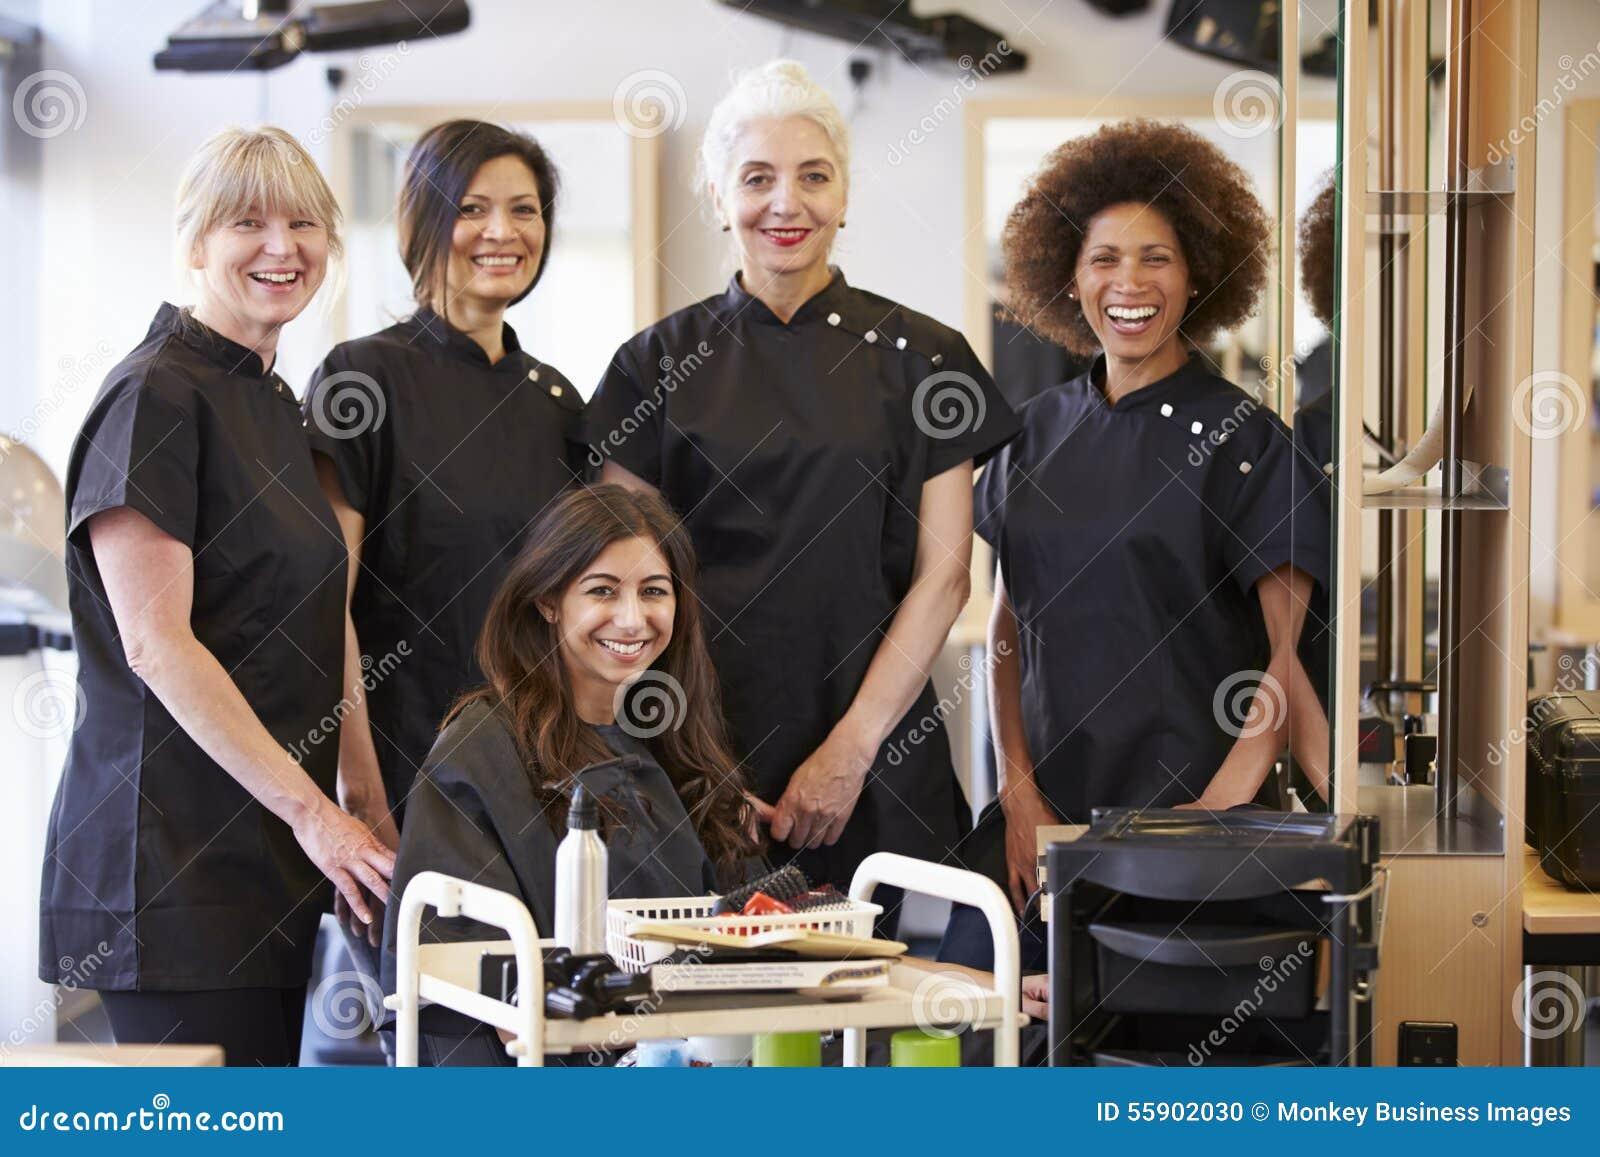 The Hair Council - Training